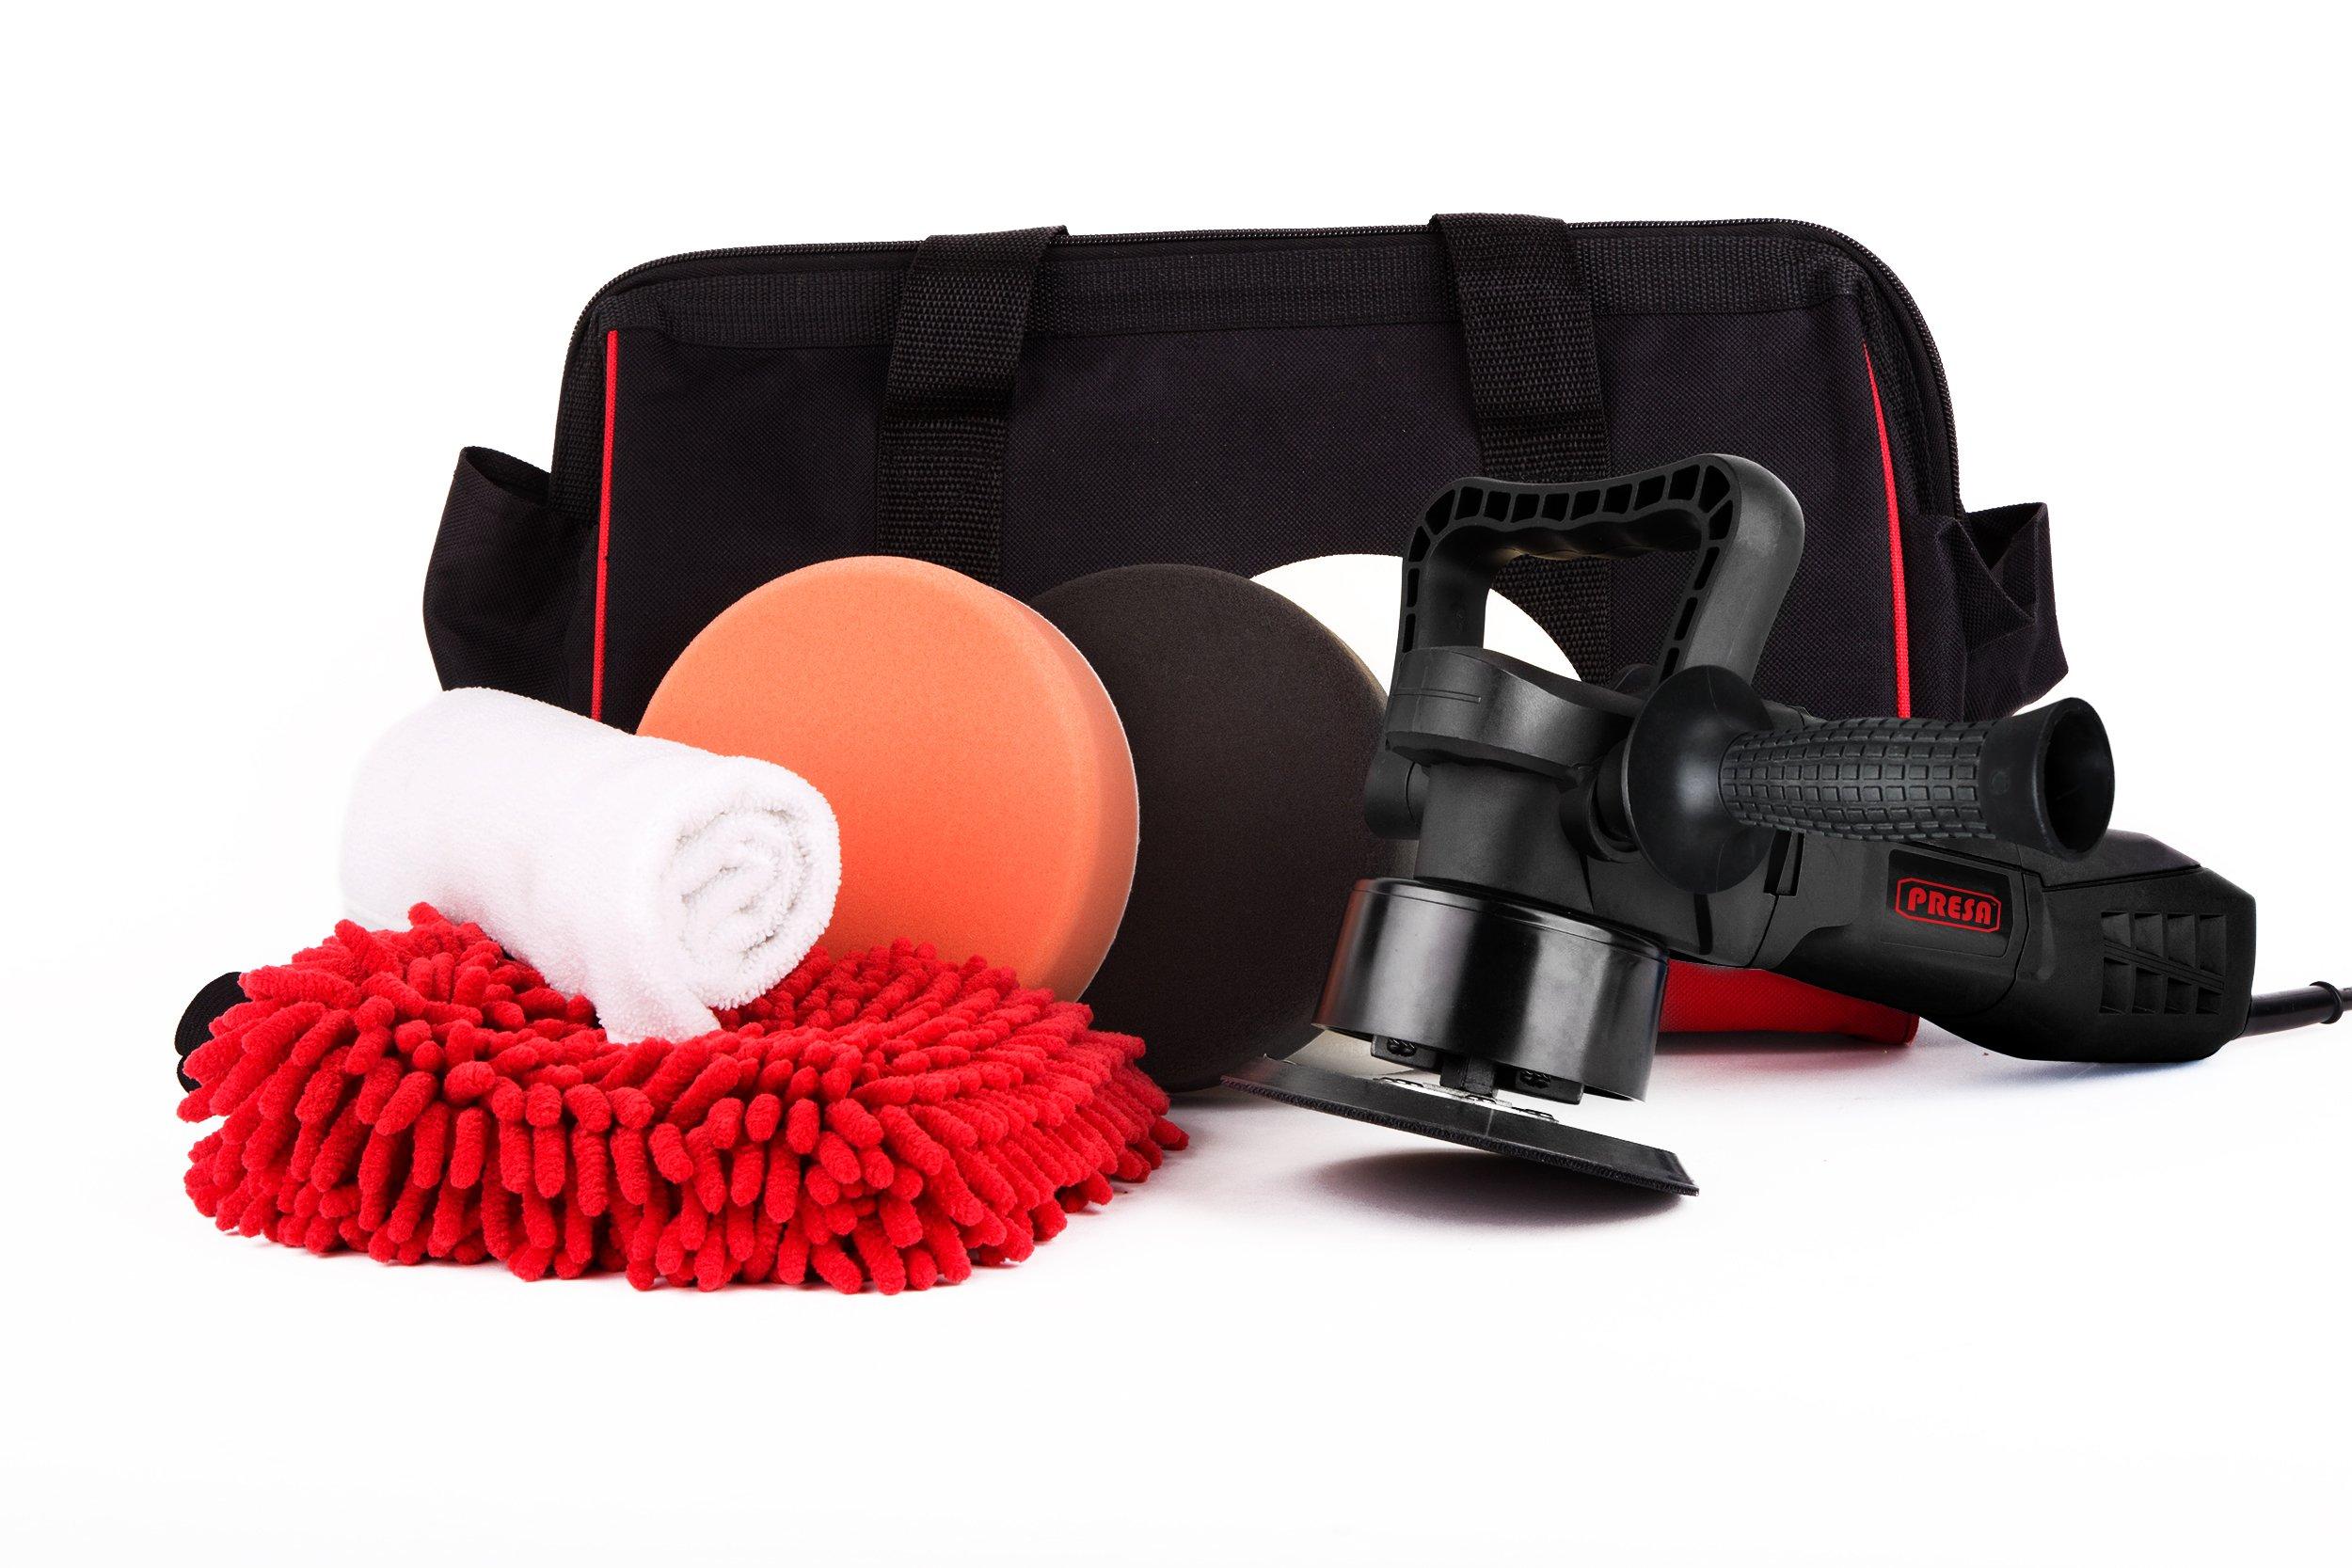 Presa Turbine All-in-One Dual Action DA Random Orbital Polisher Kit with Polishing Pads and Chenille Glove, 6''